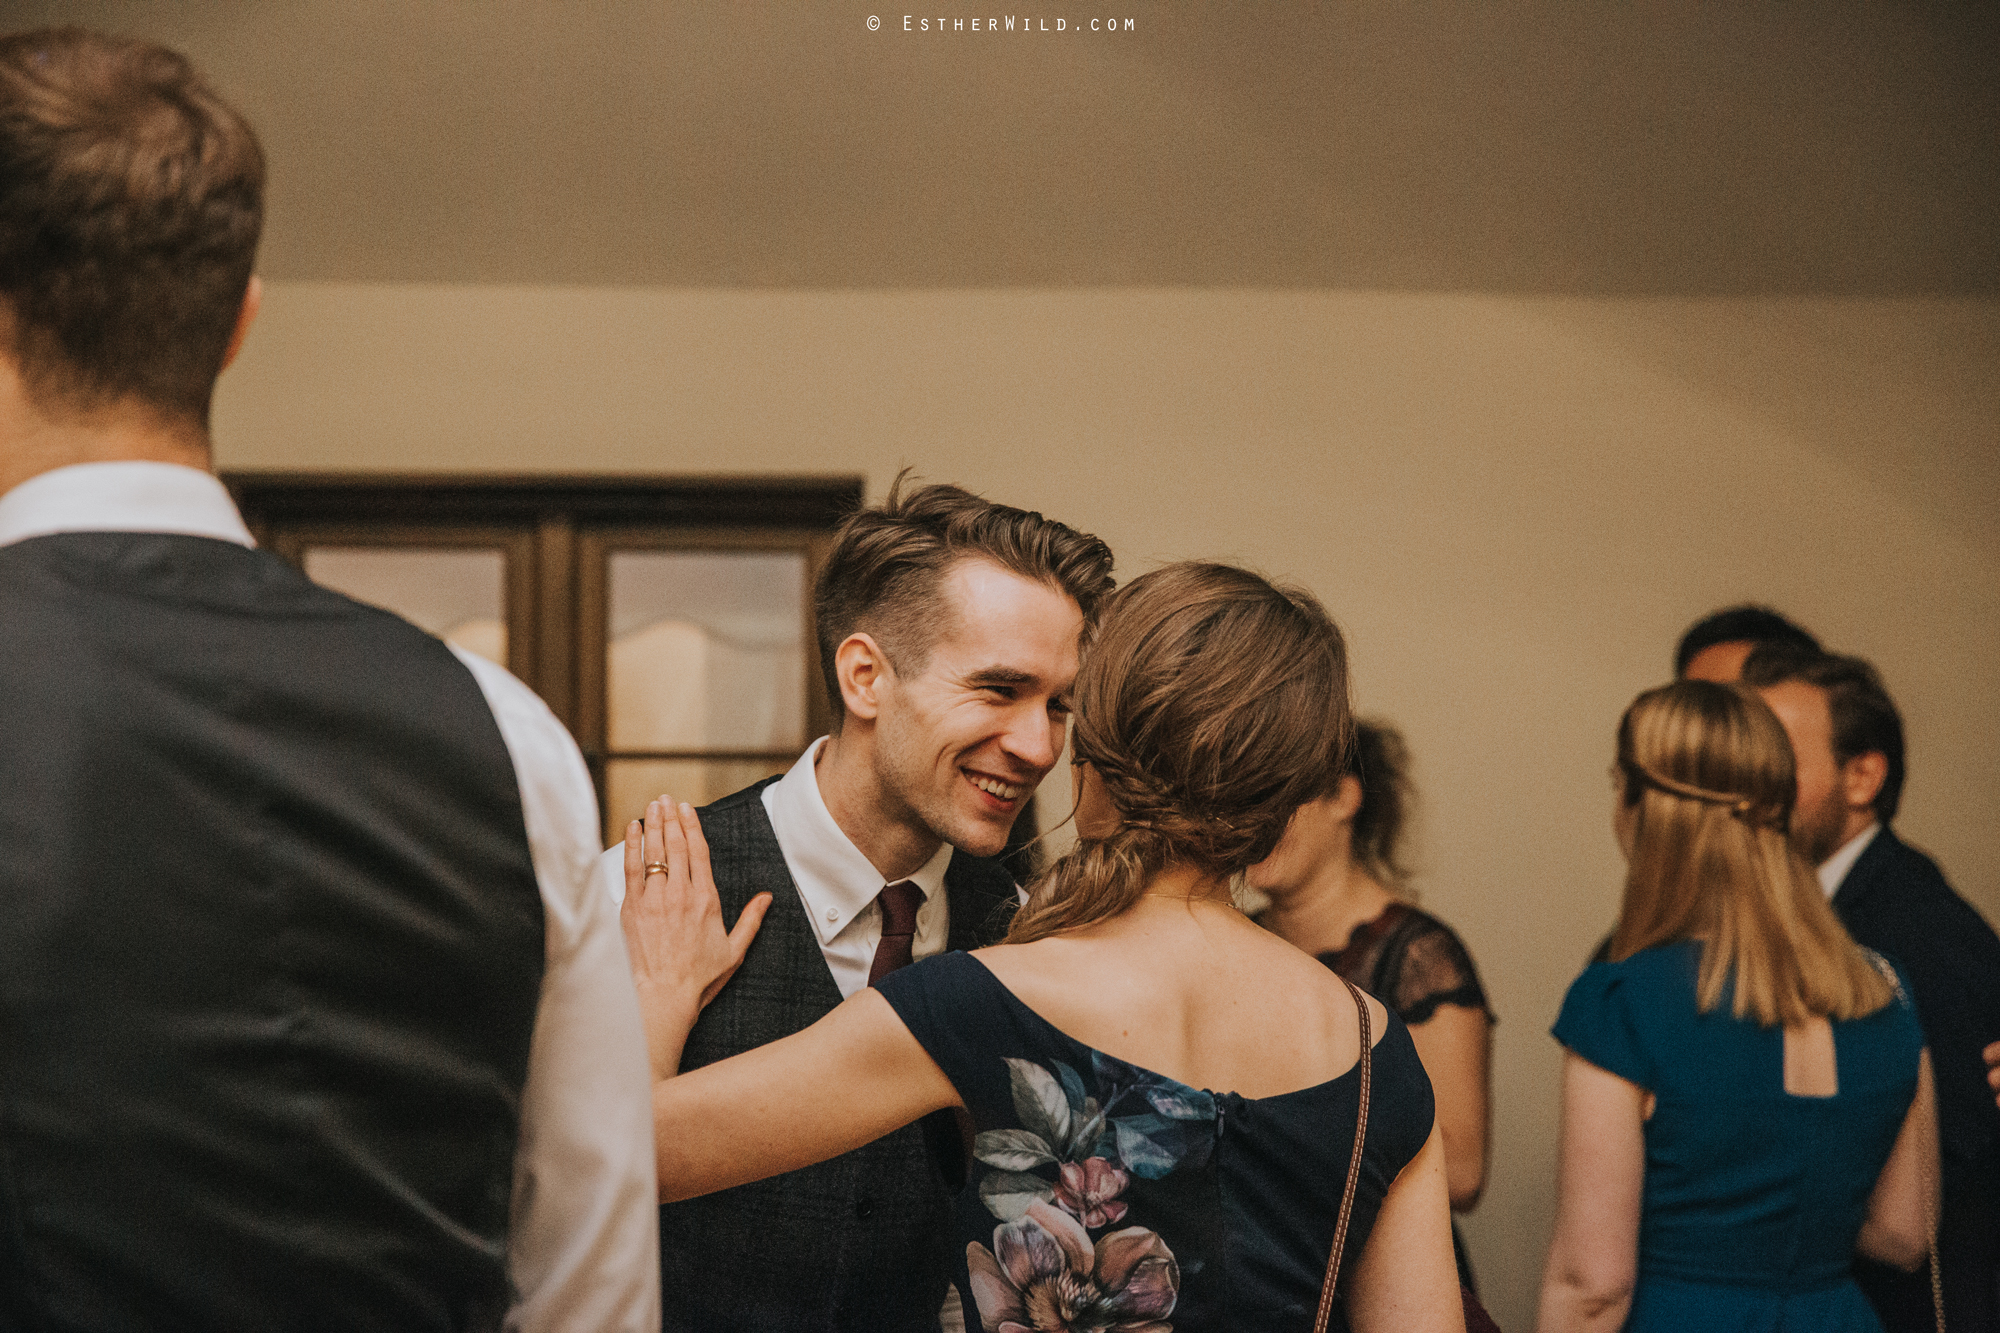 Reading_Room_Weddings_Alby_Norwich_Photographer_Esther_Wild_IMG_3634.jpg